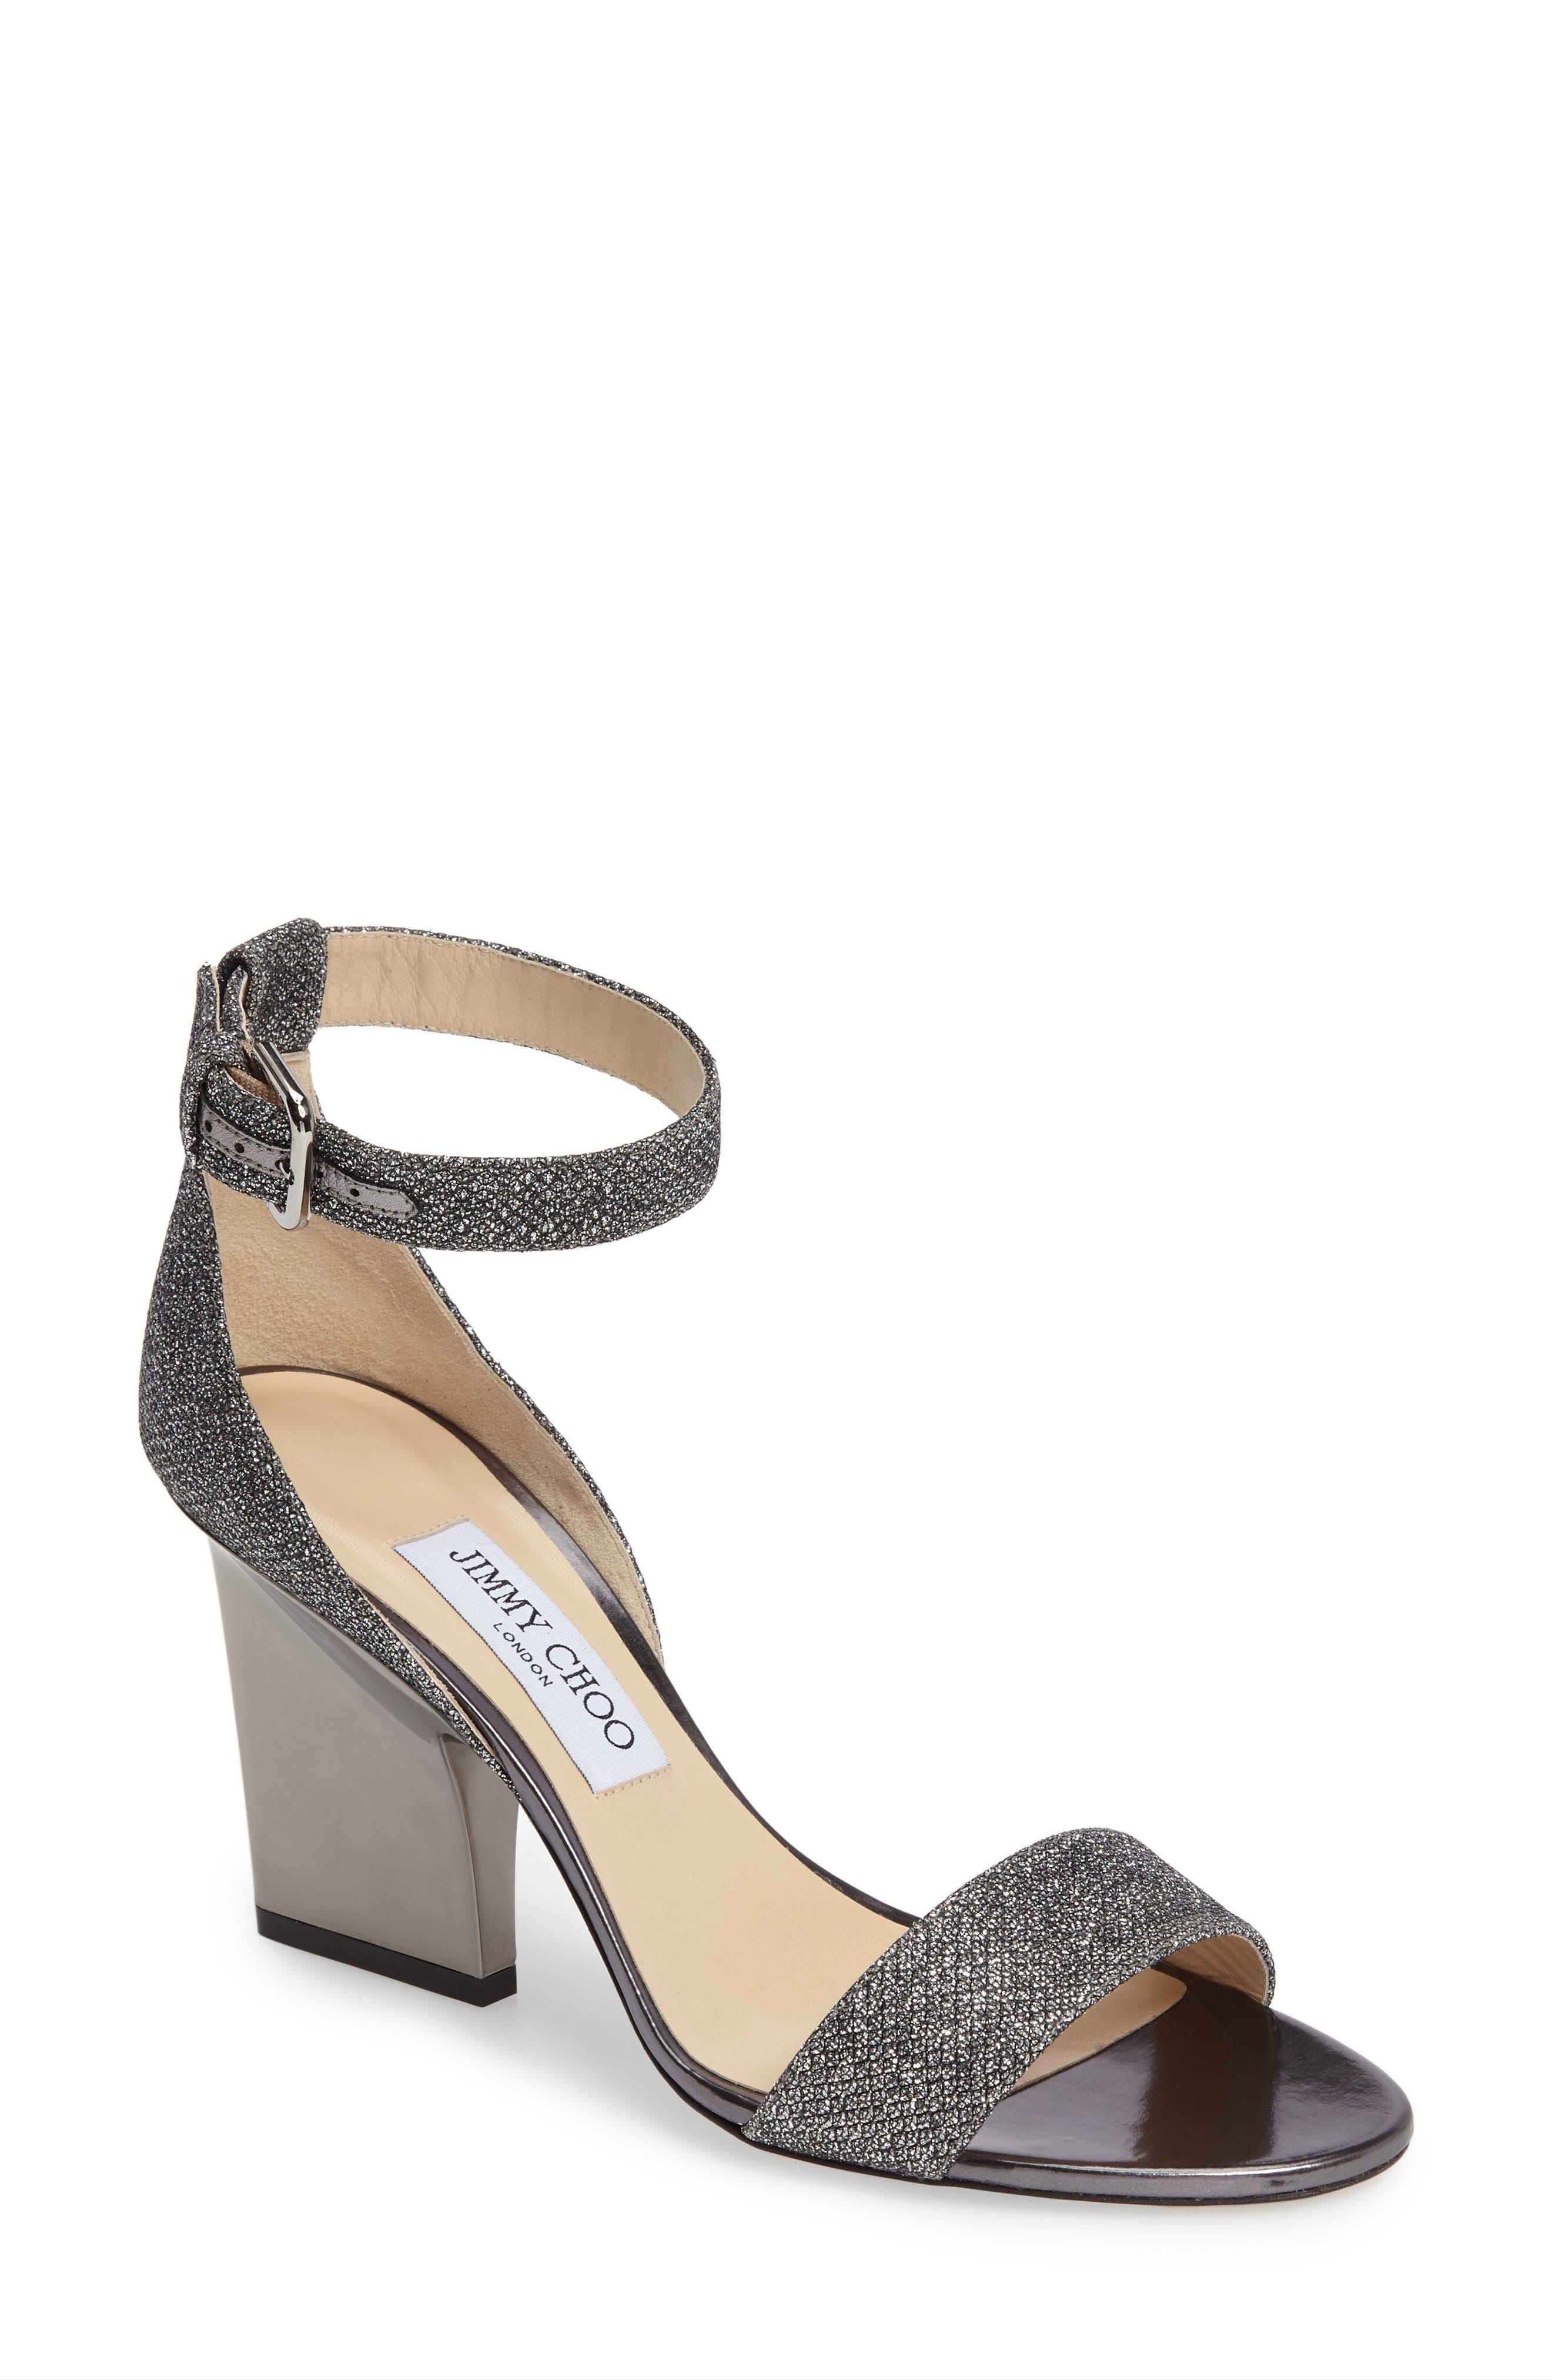 Edina Ankle Strap Sandal,                         Main,                         color, Anthracite